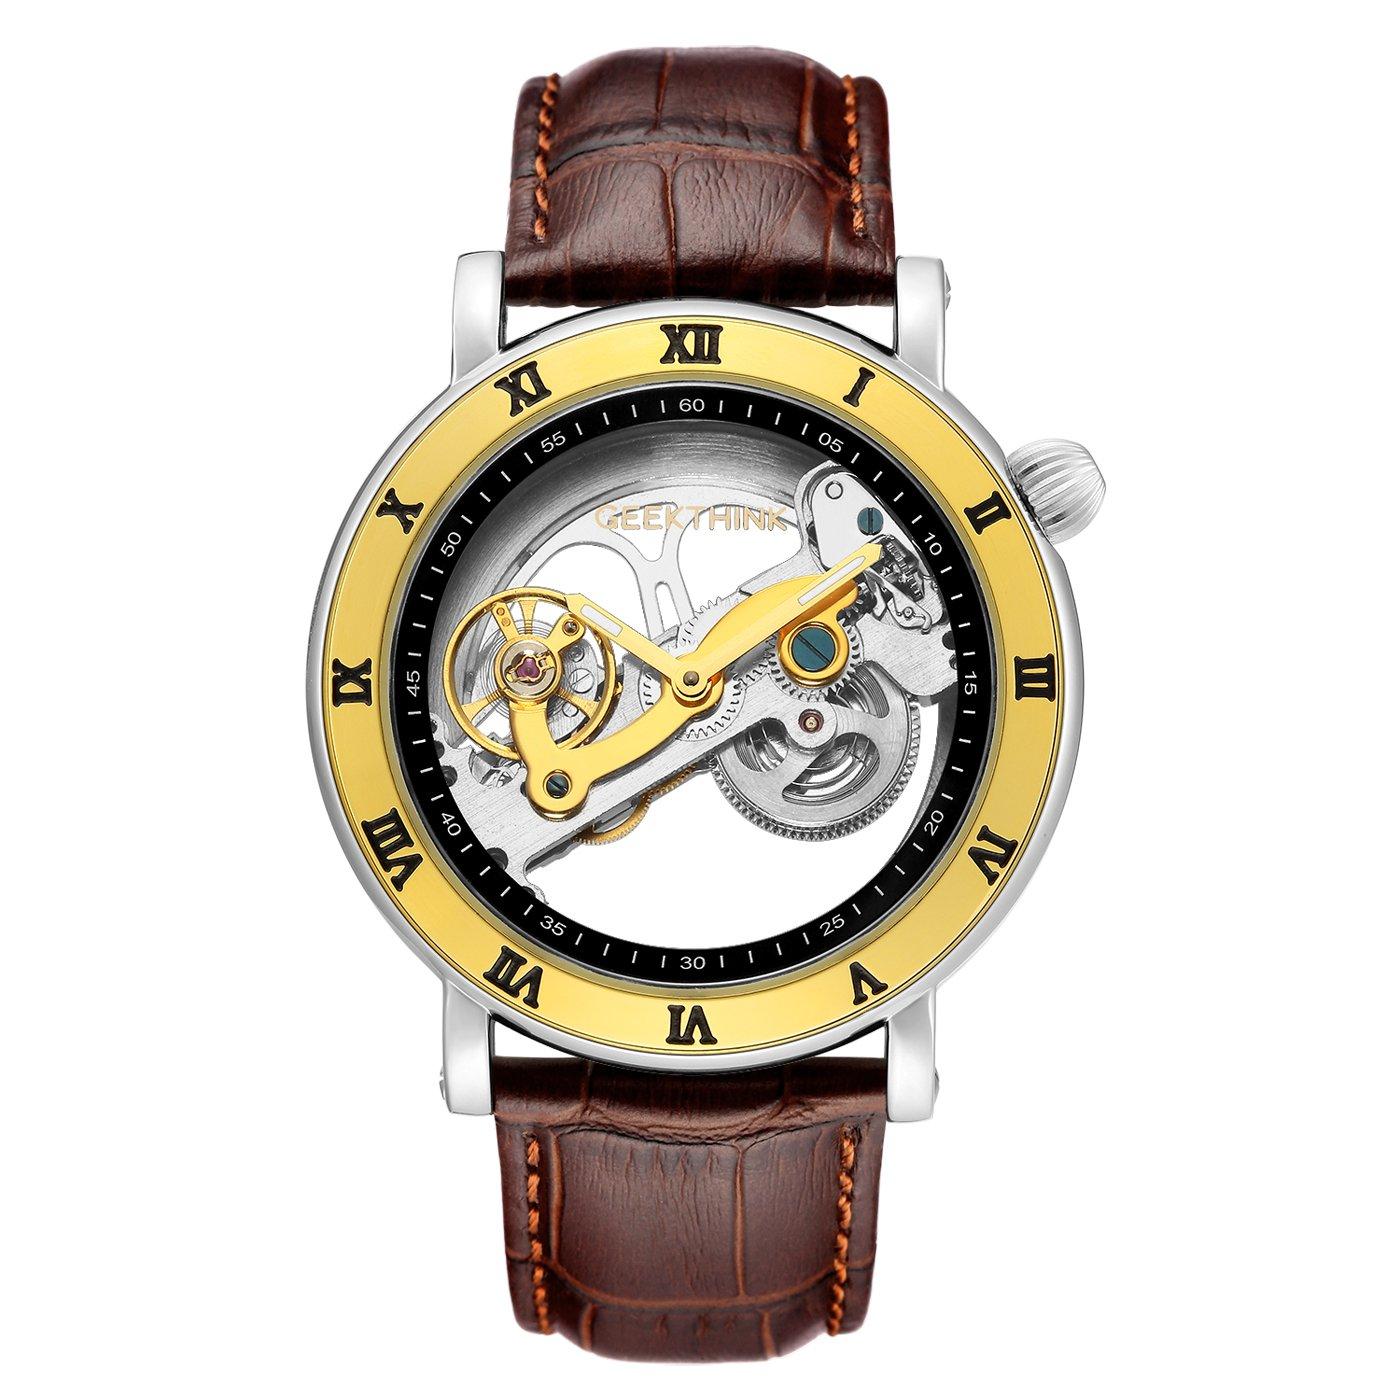 AFFUTE - Reloj de pulsera automático para hombre, correa de piel de esqueleto clásico, analógico, analógico, color marrón